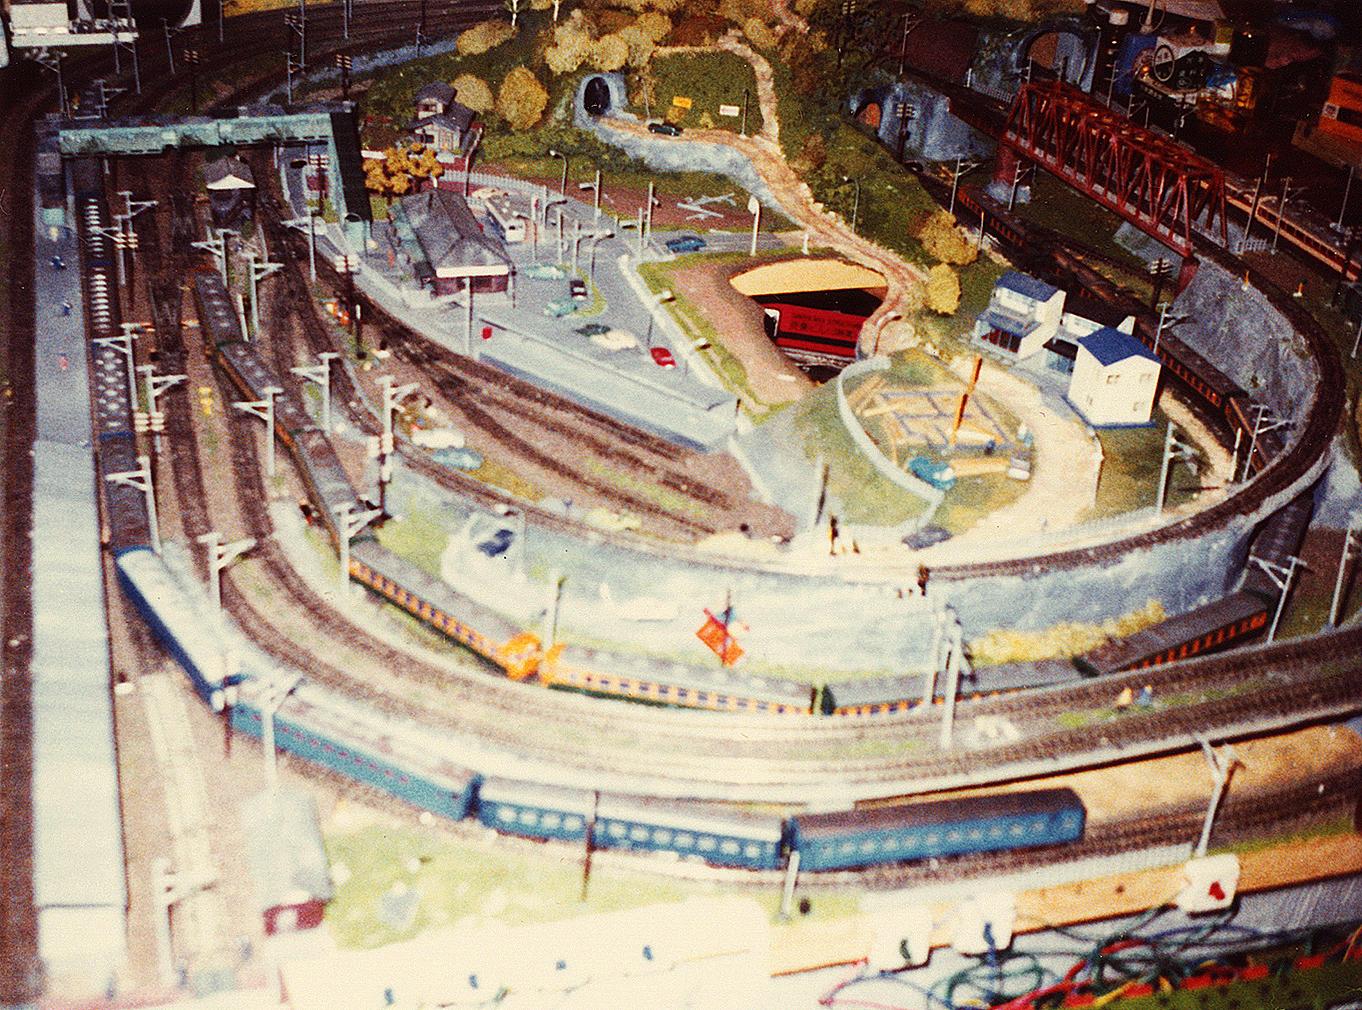 http://moritetsu.info/model-railway/img/w03k-s-ootsuka02.jpg